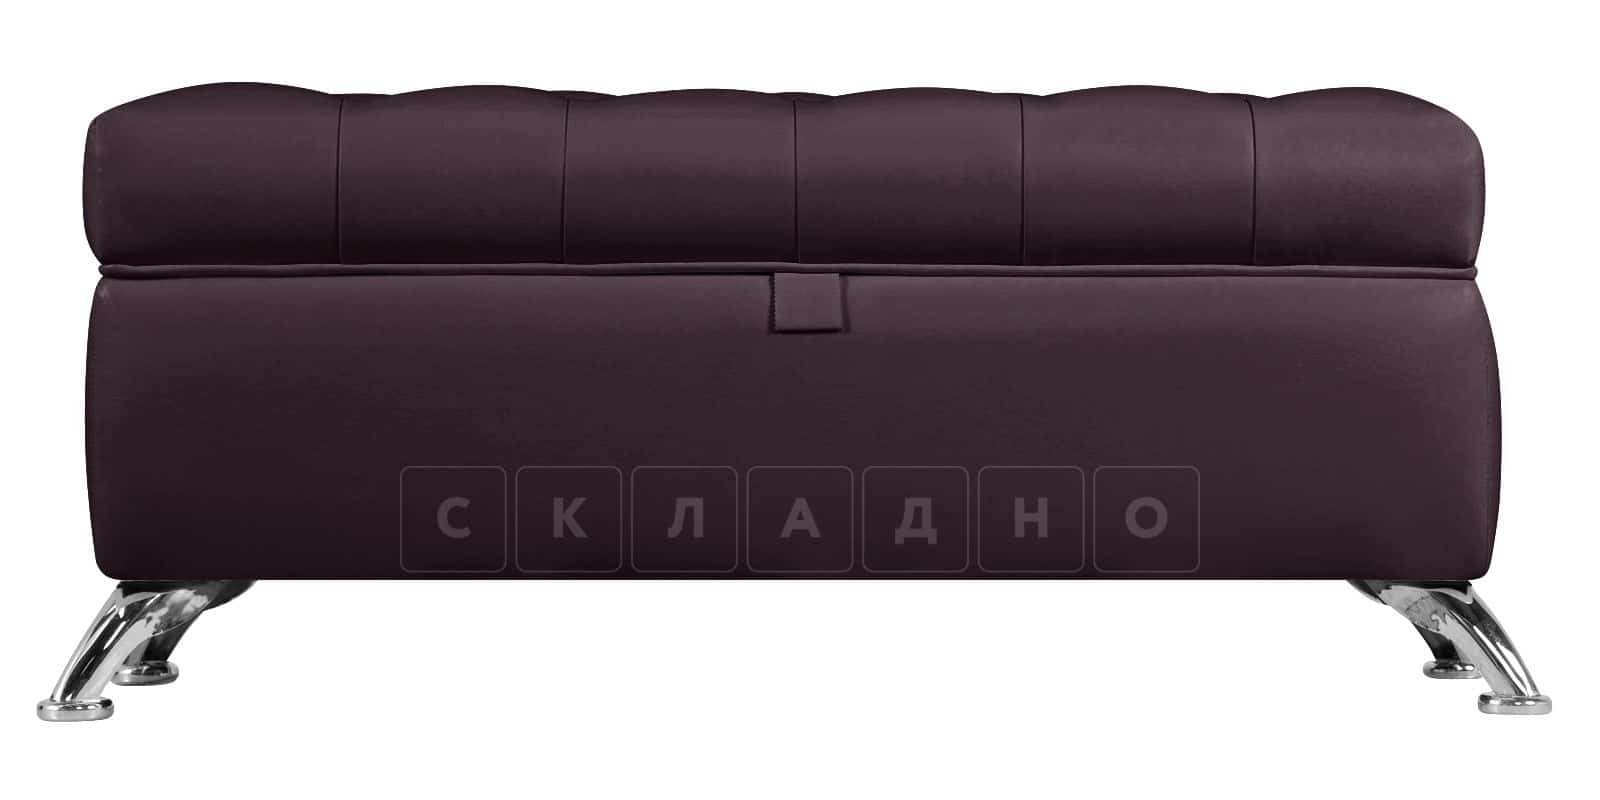 Банкетка Малибу шоколад фото 2 | интернет-магазин Складно